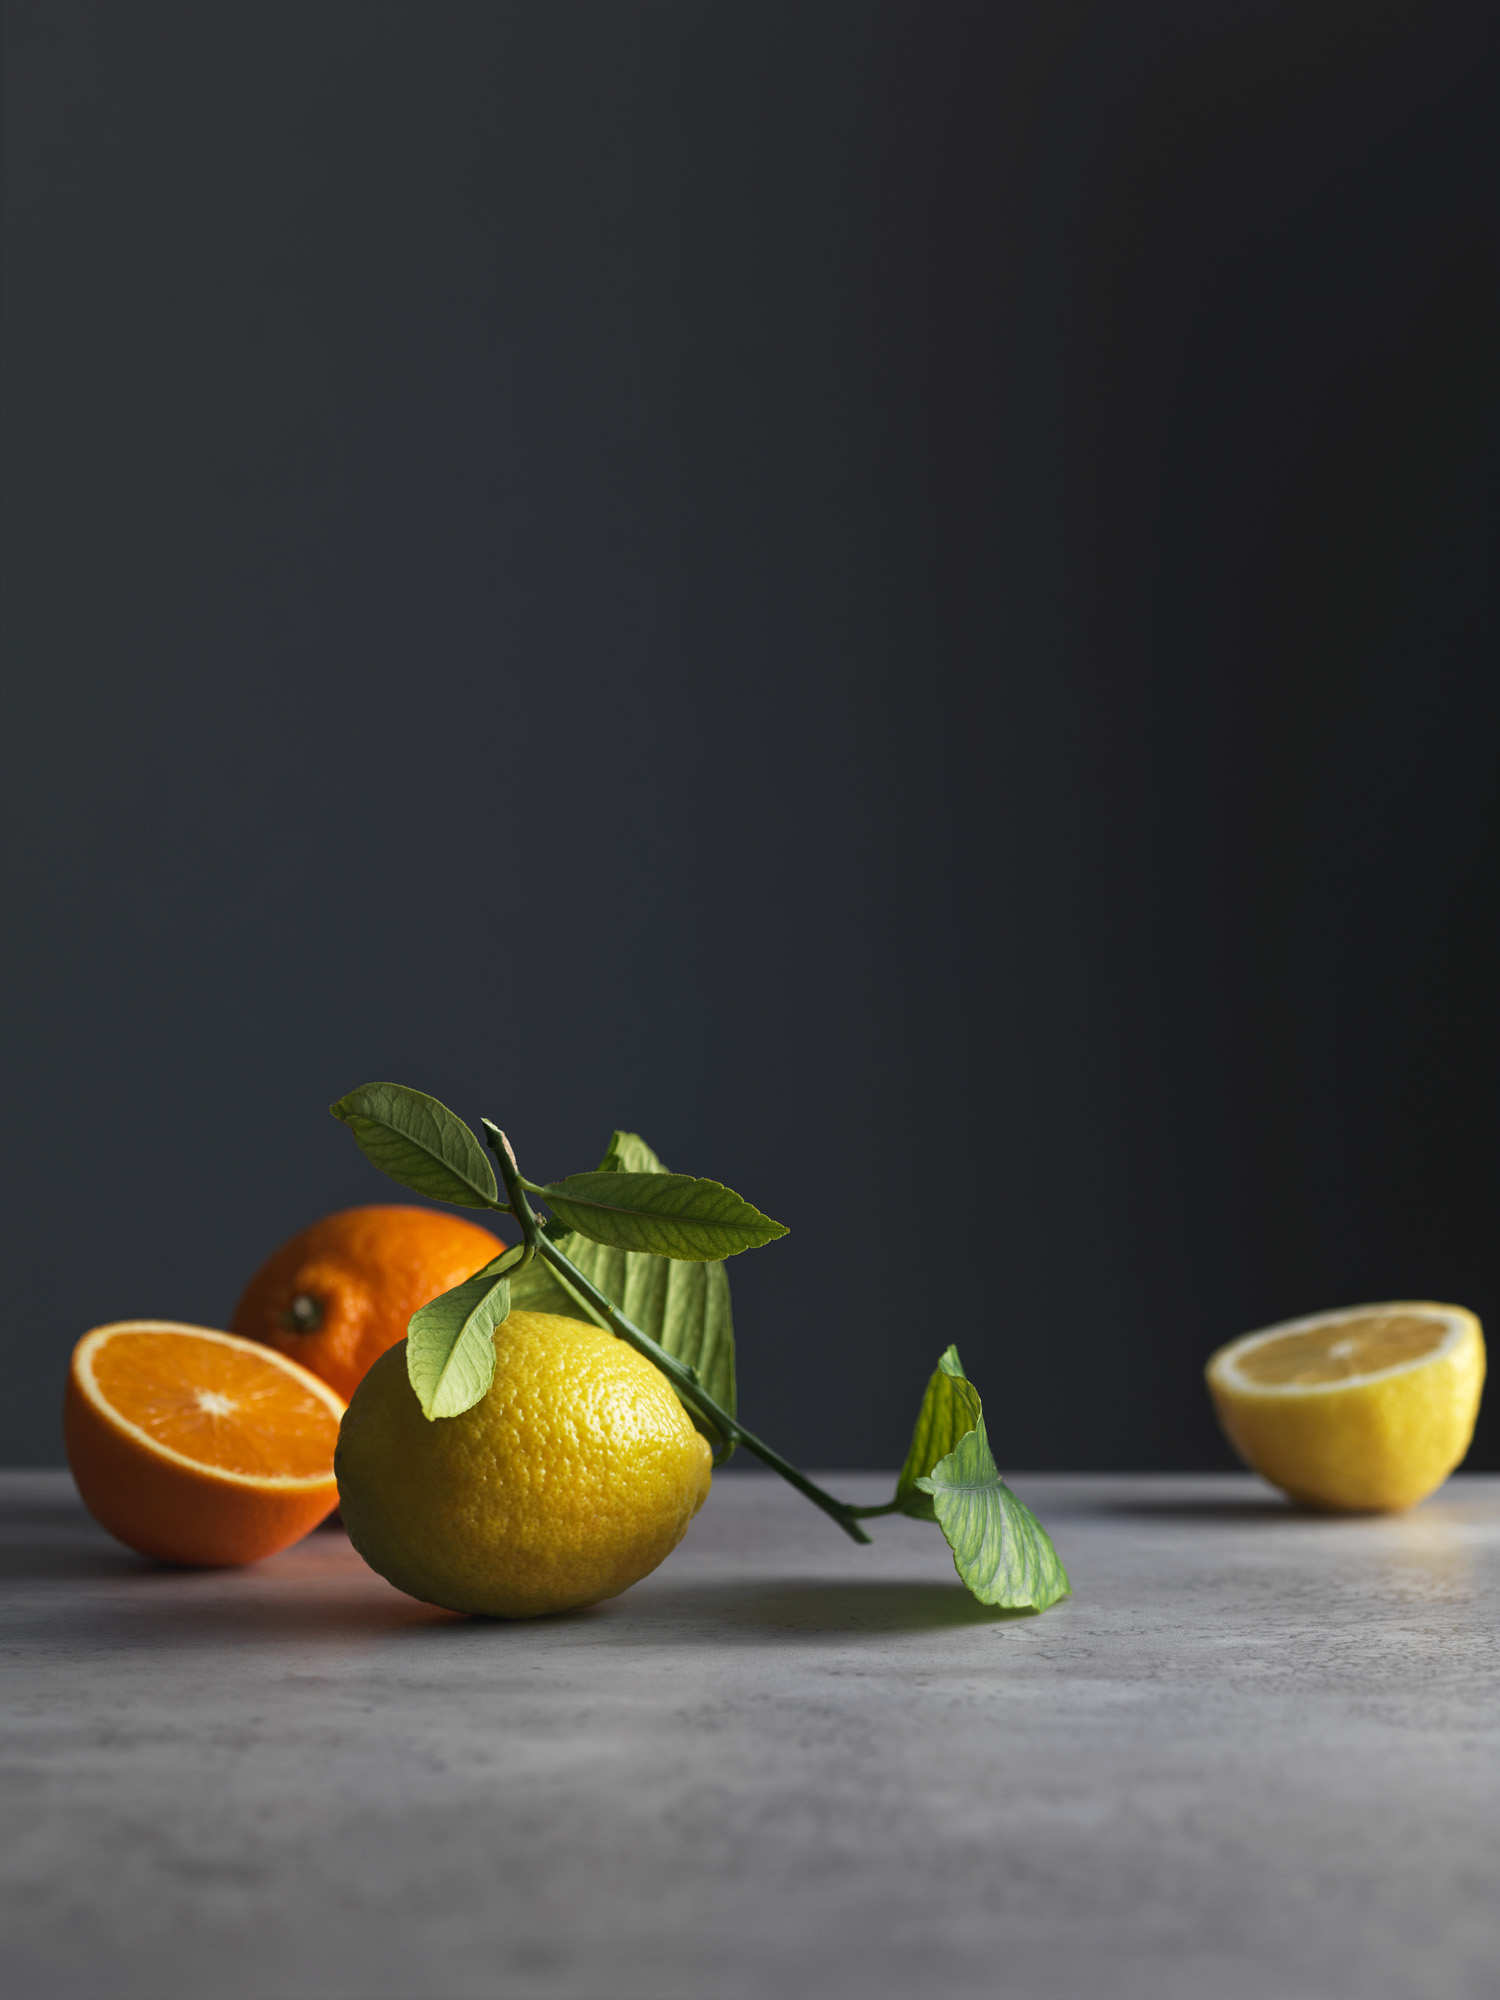 Harrods_Feb18_OrangesLemons_20.10.17_Opener1 - 066.jpg